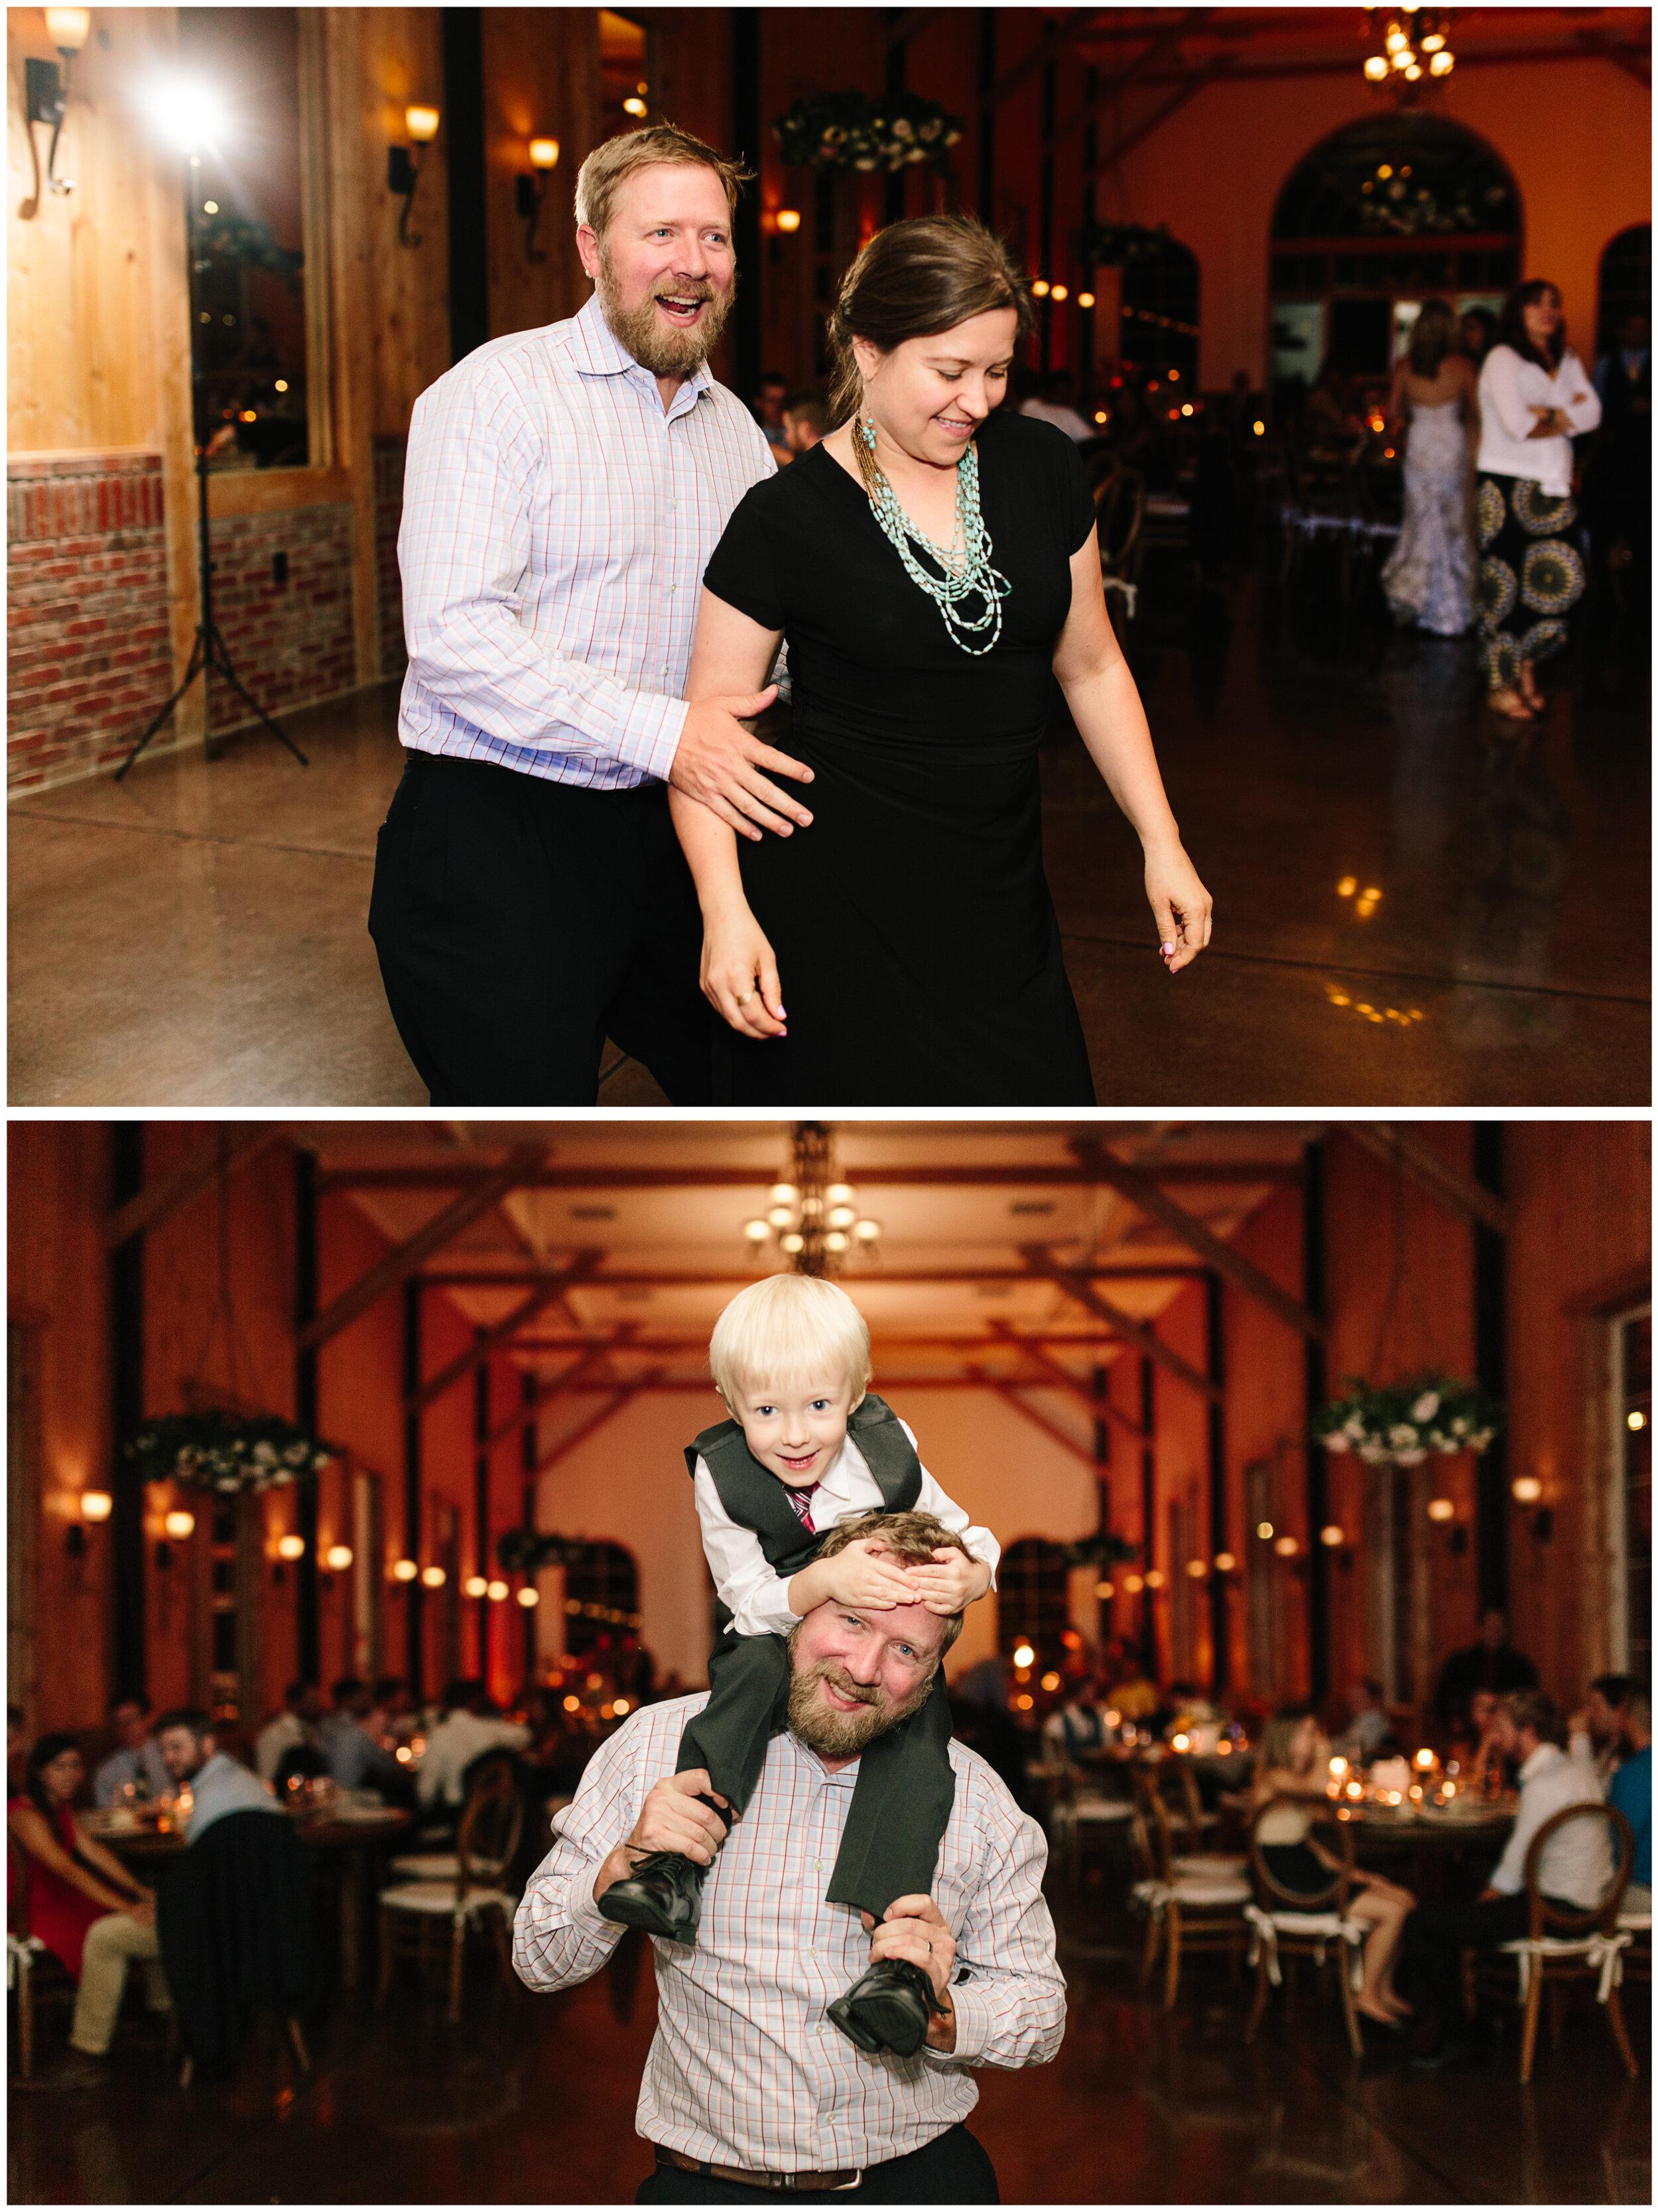 larkspur_colorado_wedding_73.jpg